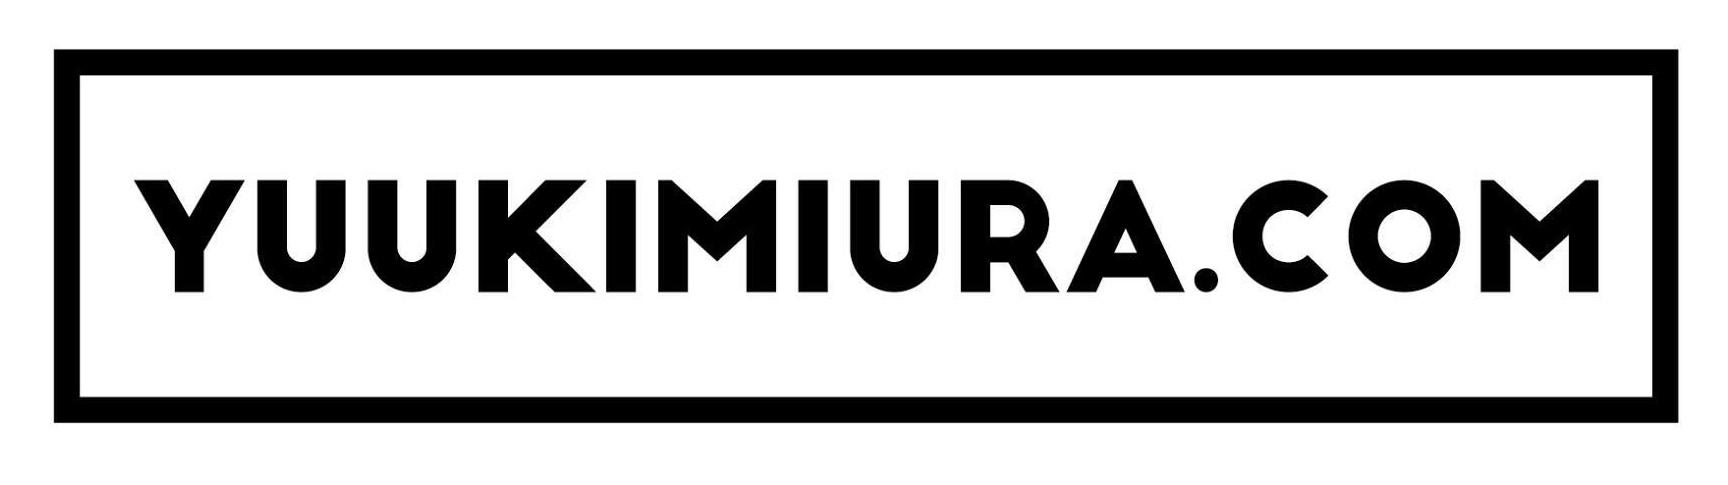 yuukimiura.com